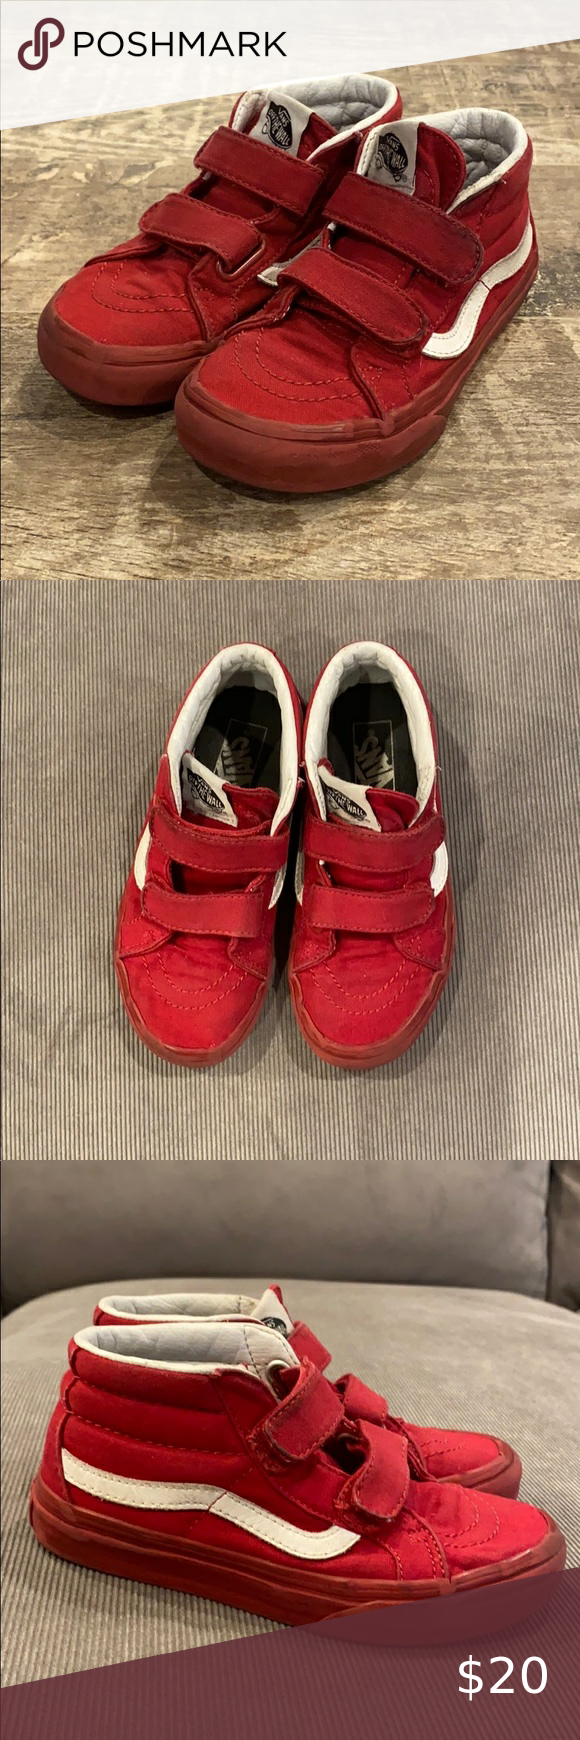 Vans Kid's Skateboard Shoe in 2020